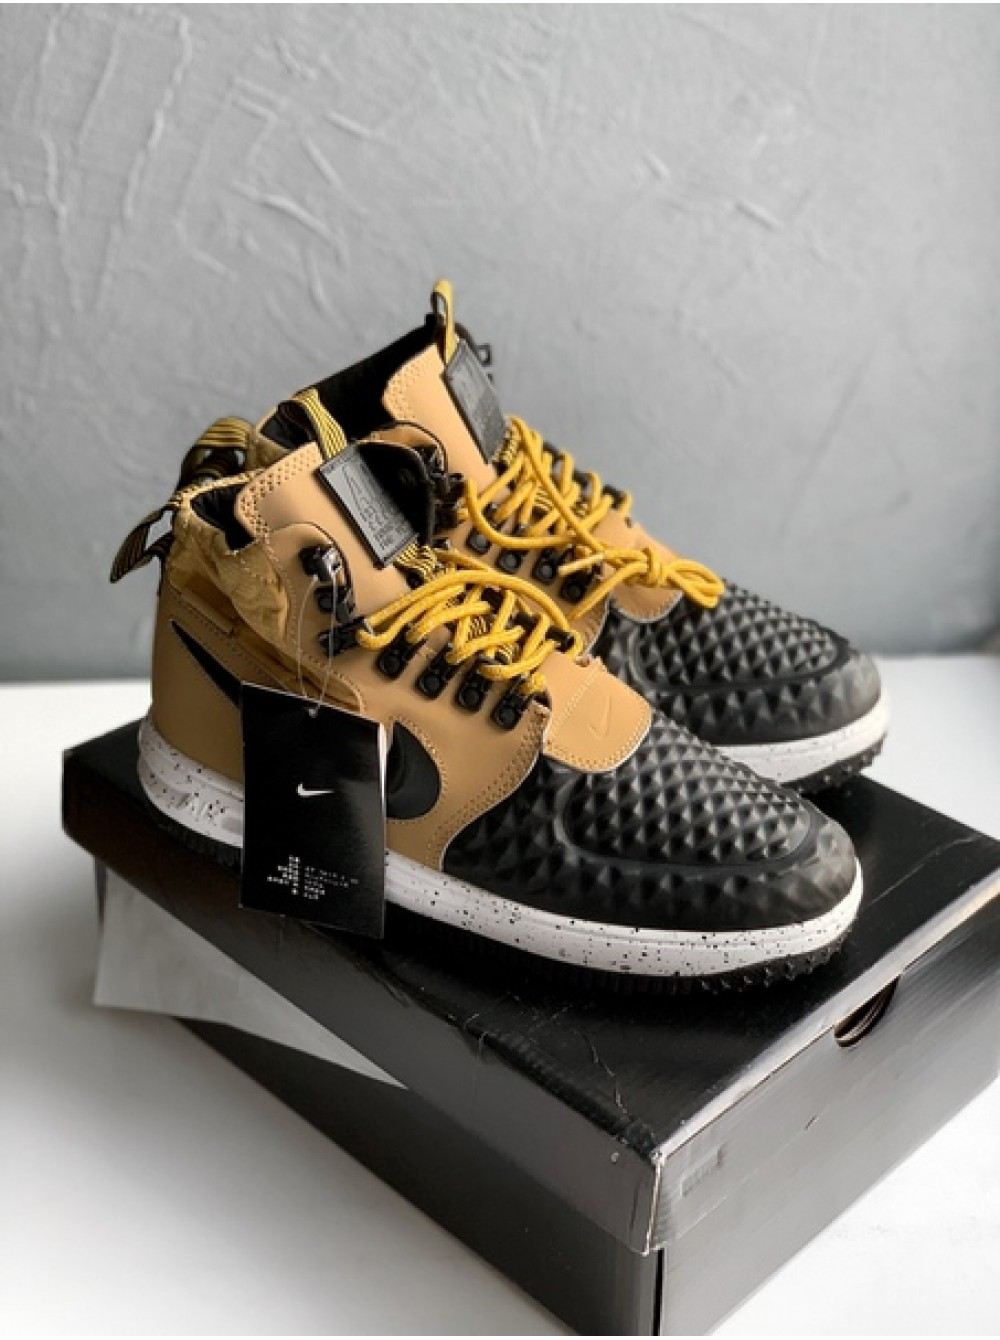 best service fecd0 9c139 Кроссовки Nike Lunar Force 1 Duckboot  17 (Metallic Gold Black-Light Bone)